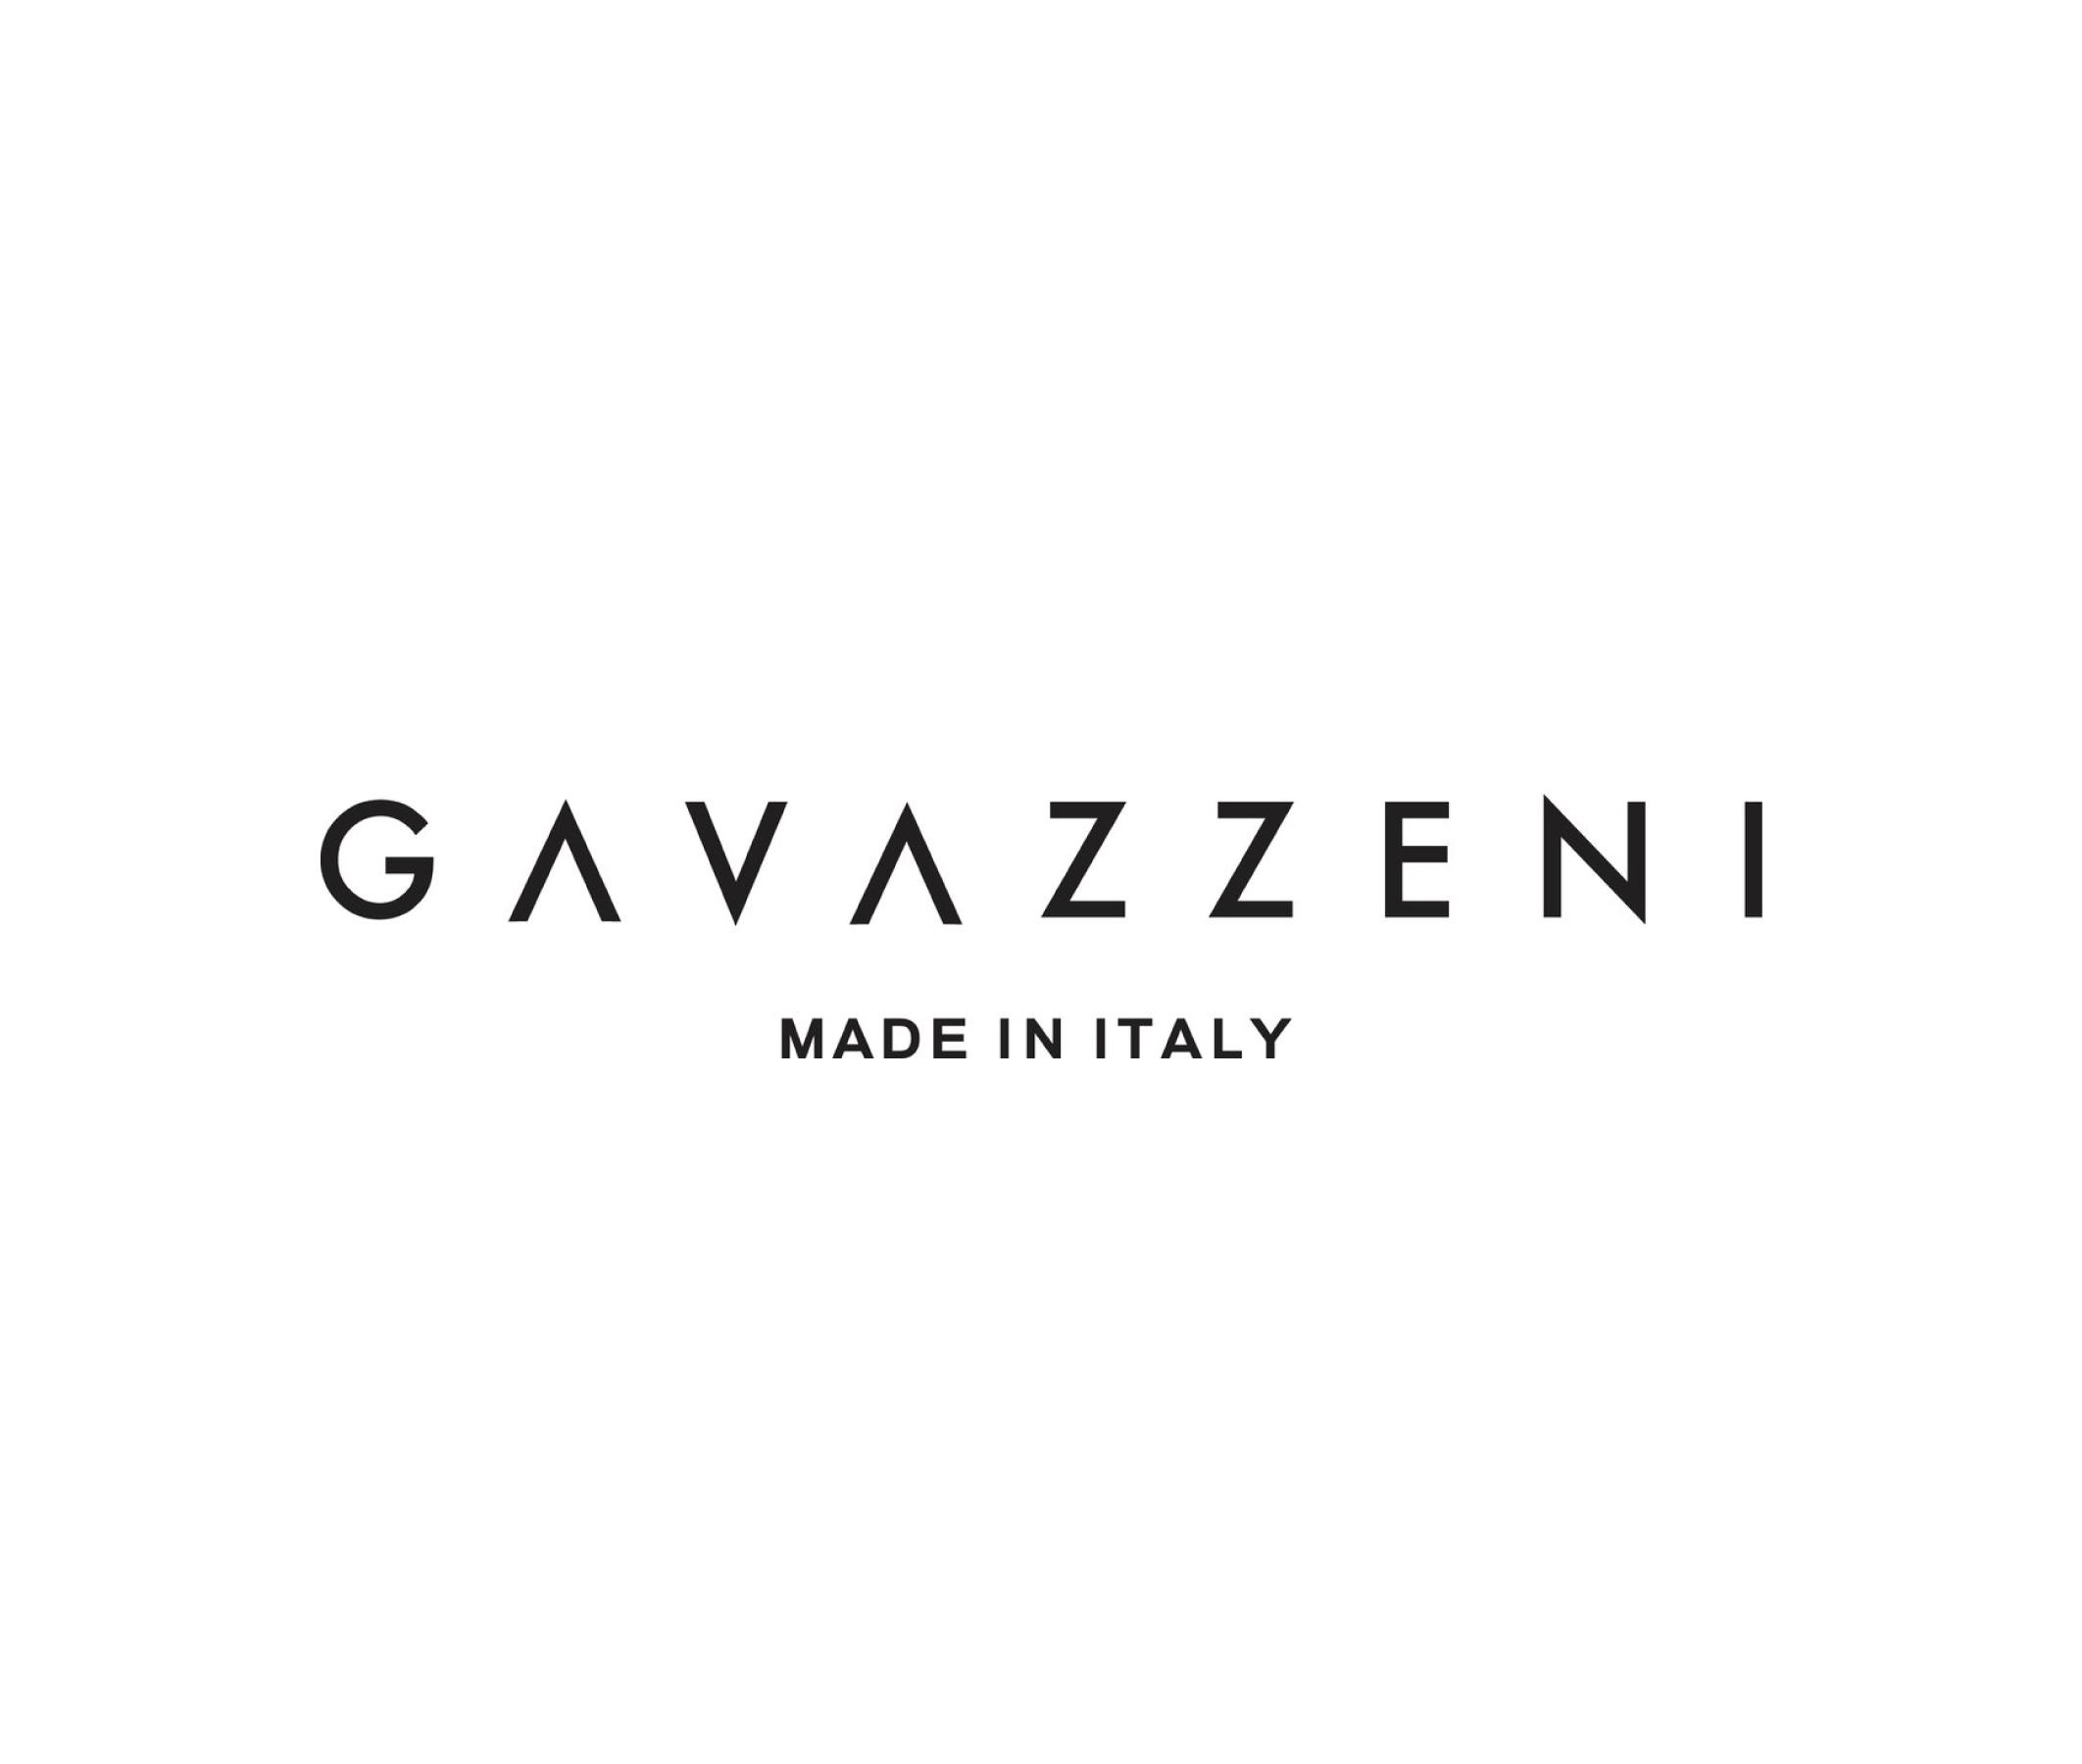 DC Website Logos - GAVAZZENI